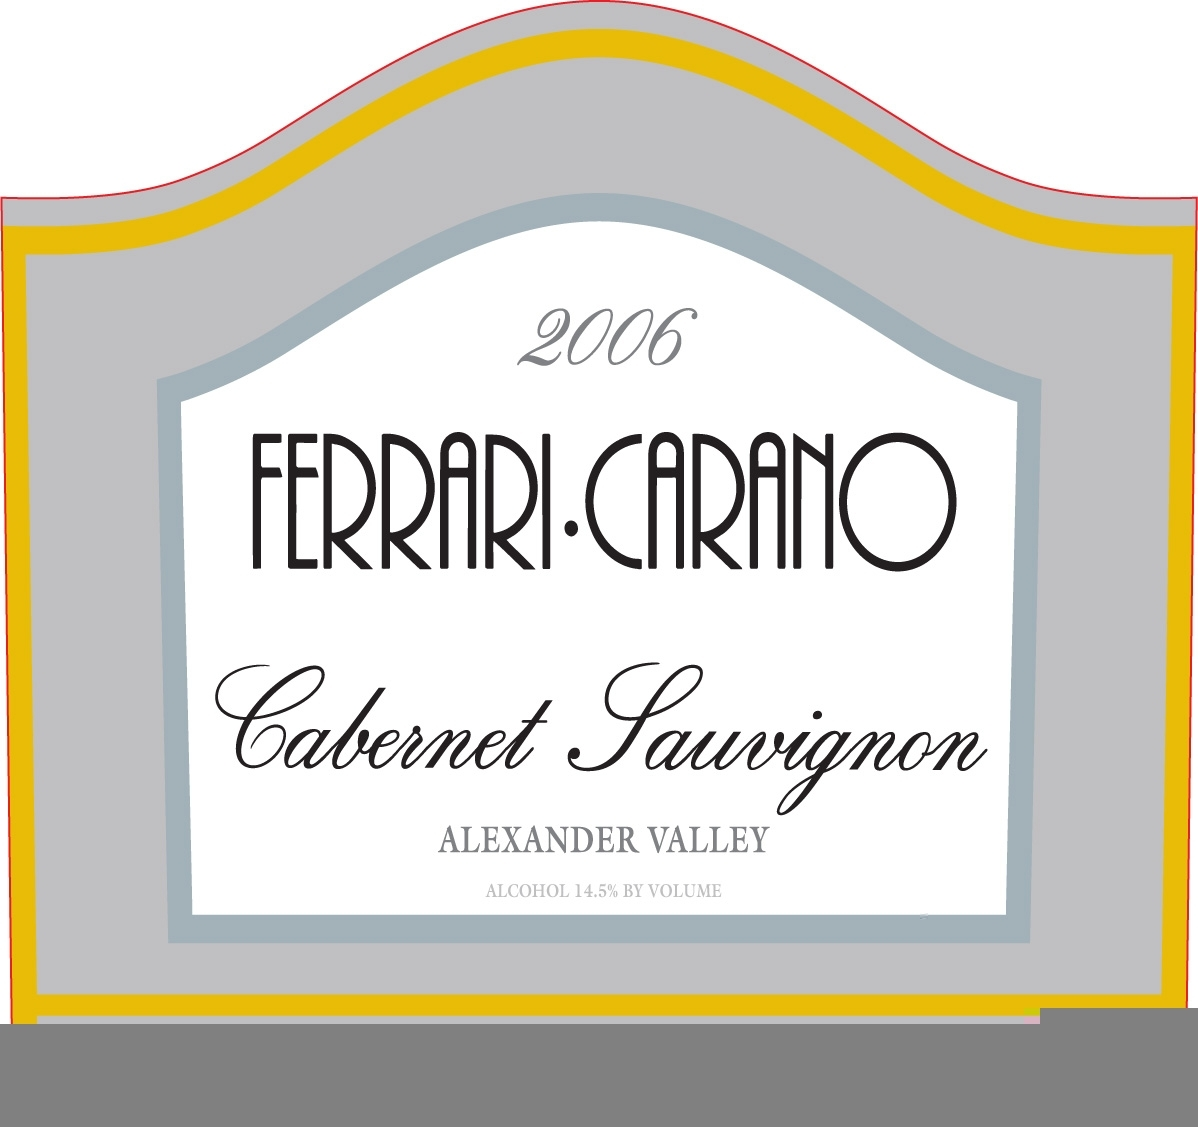 法拉利卡诺酒庄赤霞珠干红Ferrari-Carano Cabernet Sauvignon Alexander Valley